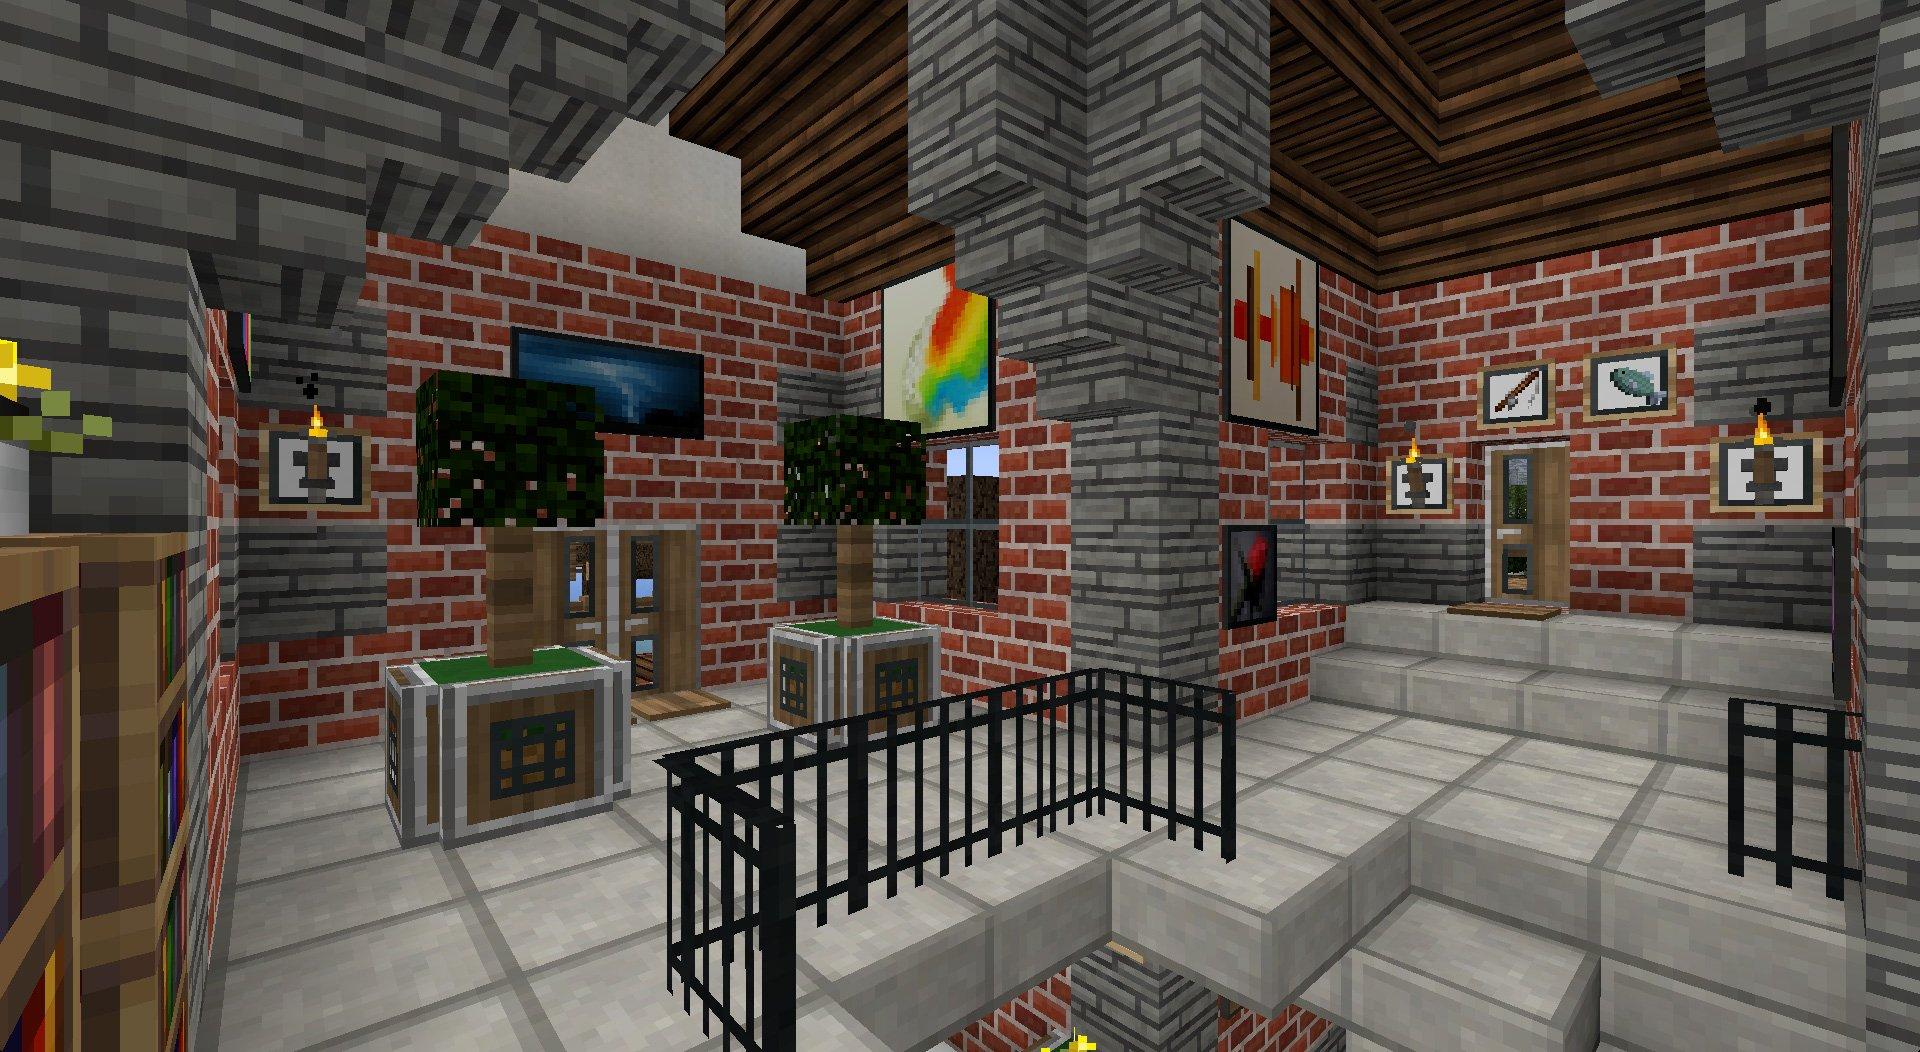 Pamplemousse Minecraft exture Packs - ^